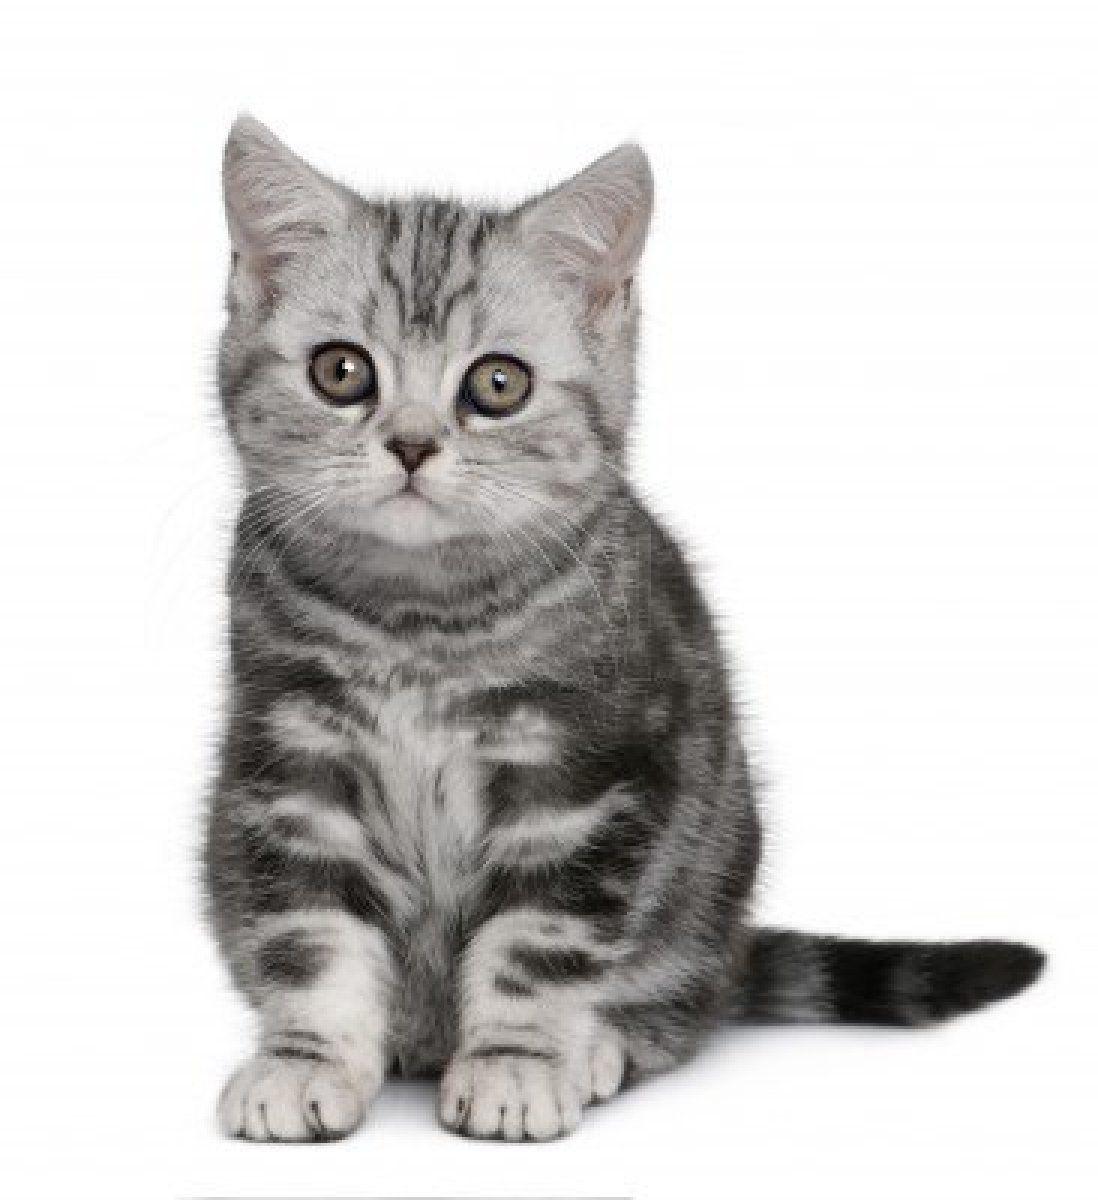 7128073 British Shorthair Kitten 10 Months Old In Front Of A White Background Jpg 1 098 1 200 Pixels Katte